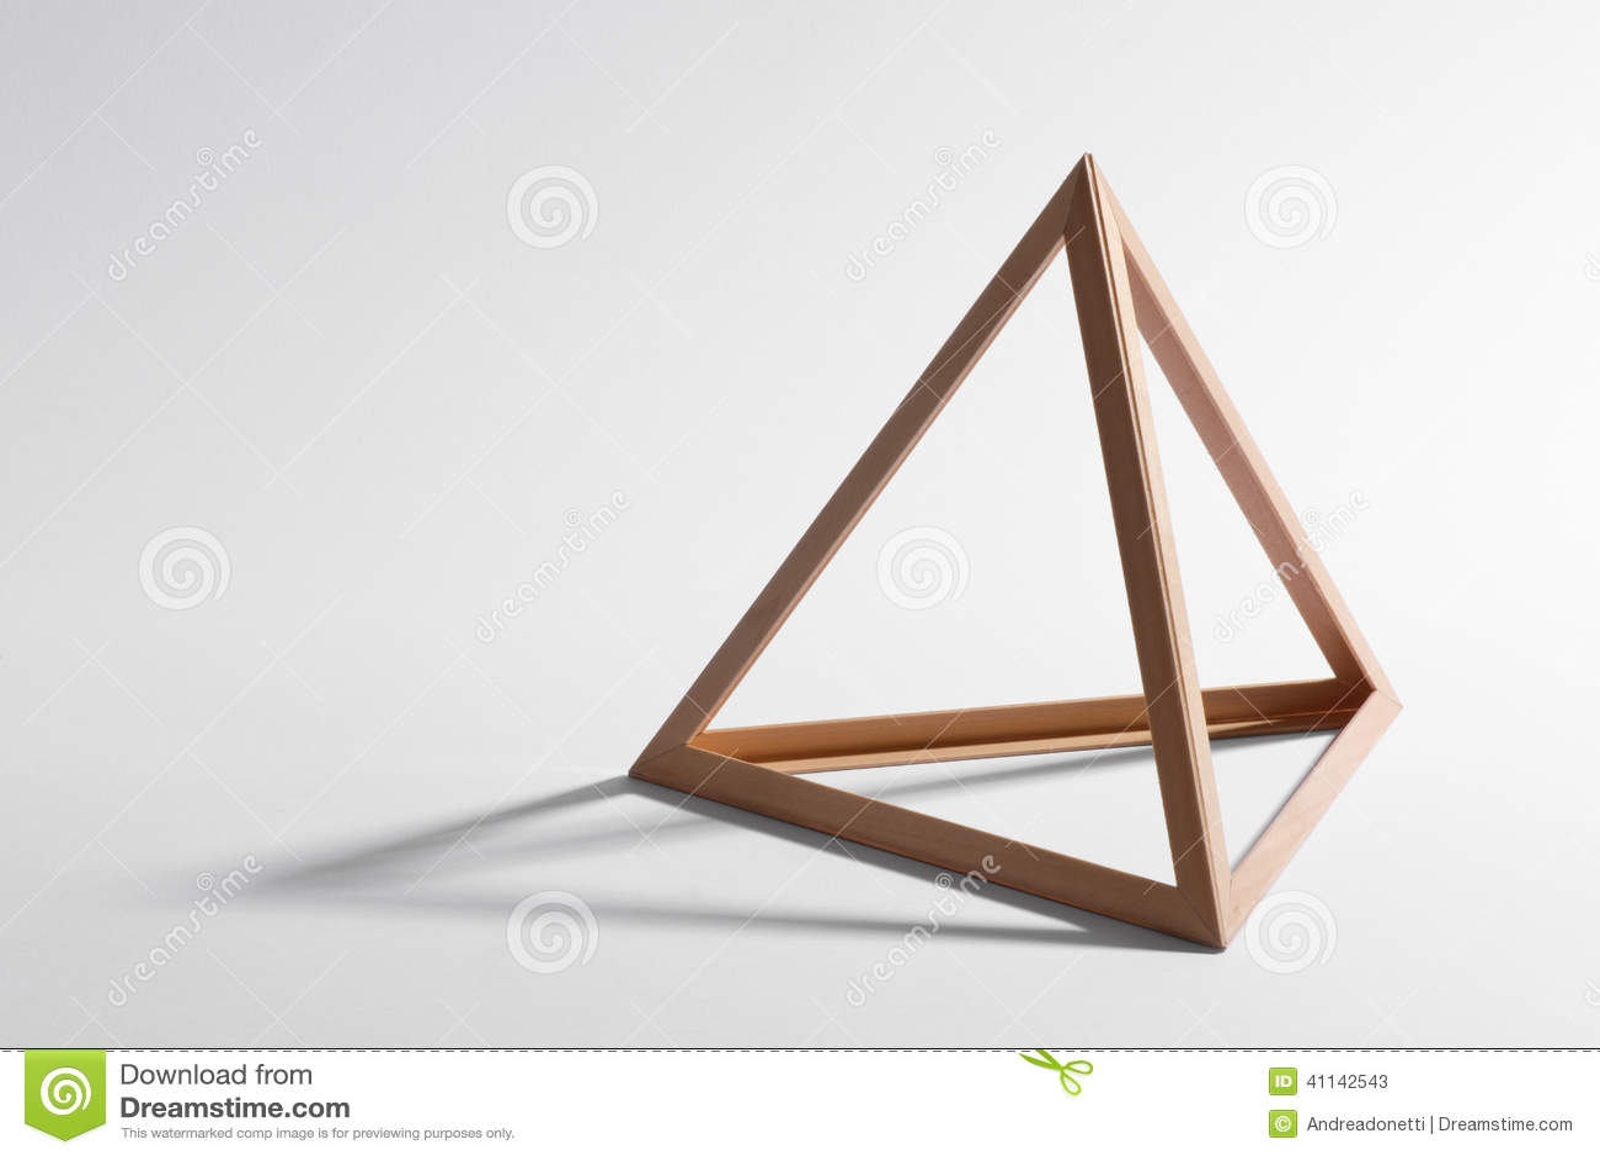 wooden triangular frame stock photos